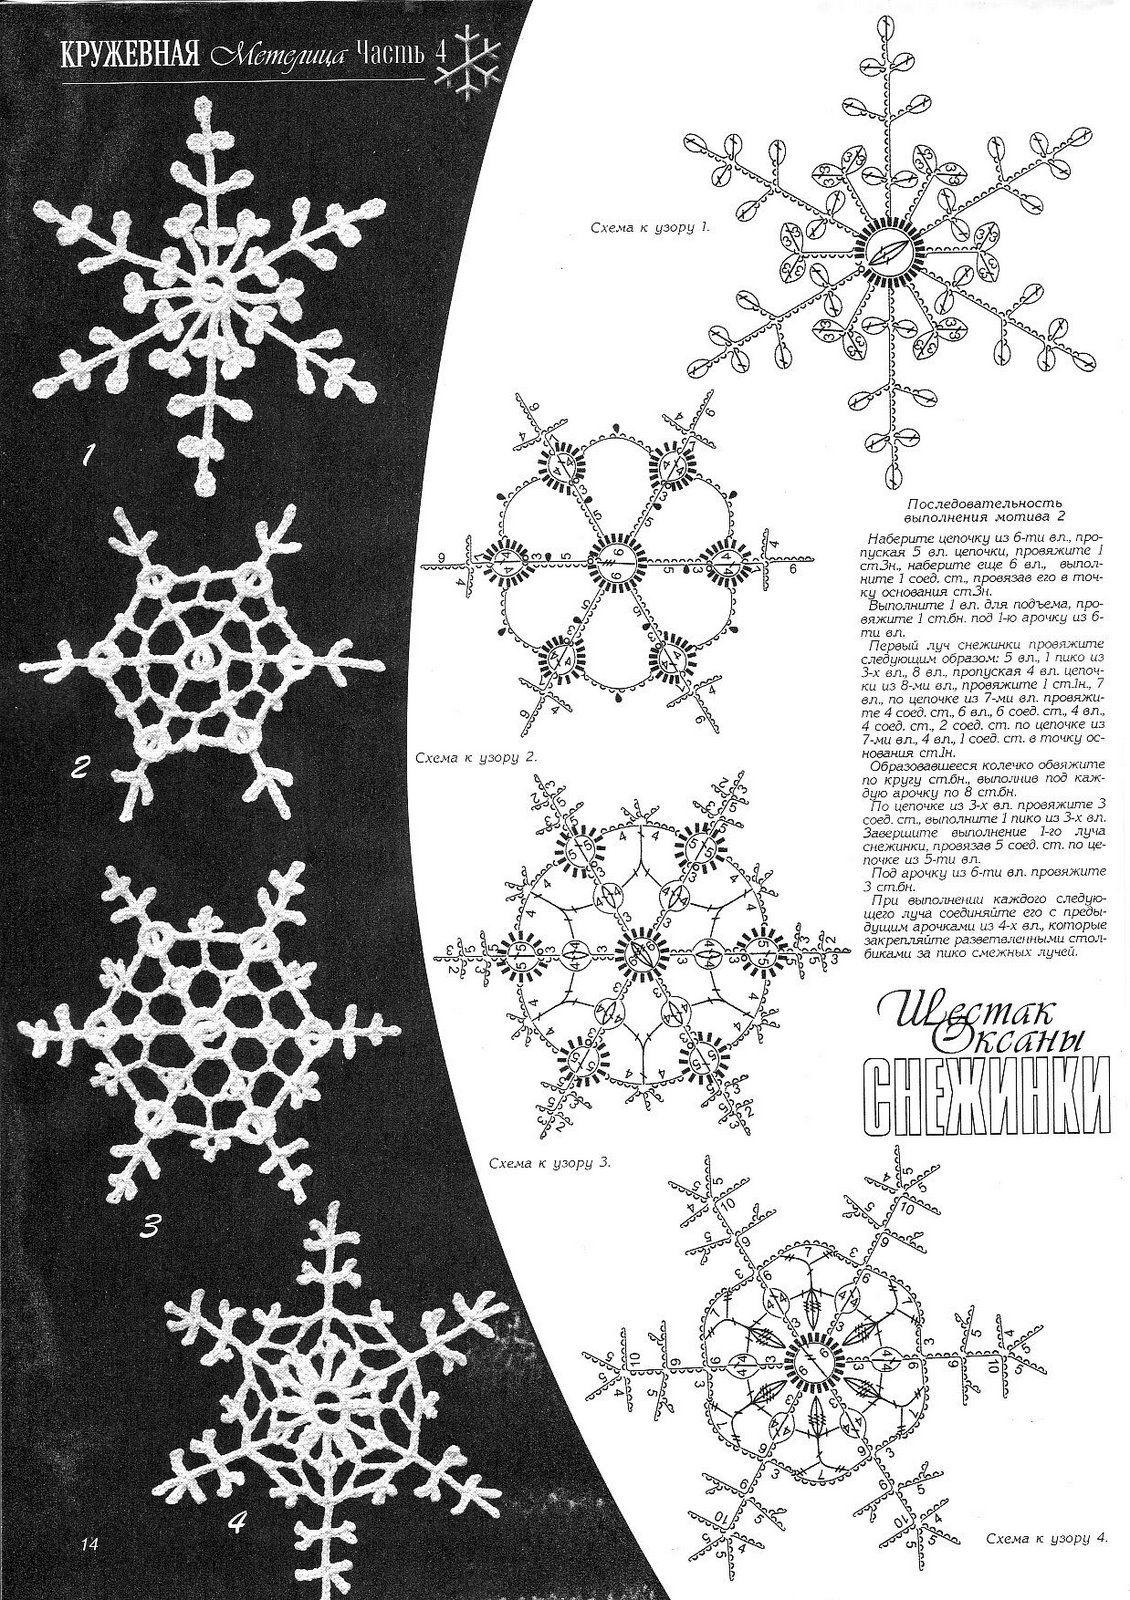 Esquemas de copos de nieve | SexyCrochet.COM | Esferas, snowflakes ...